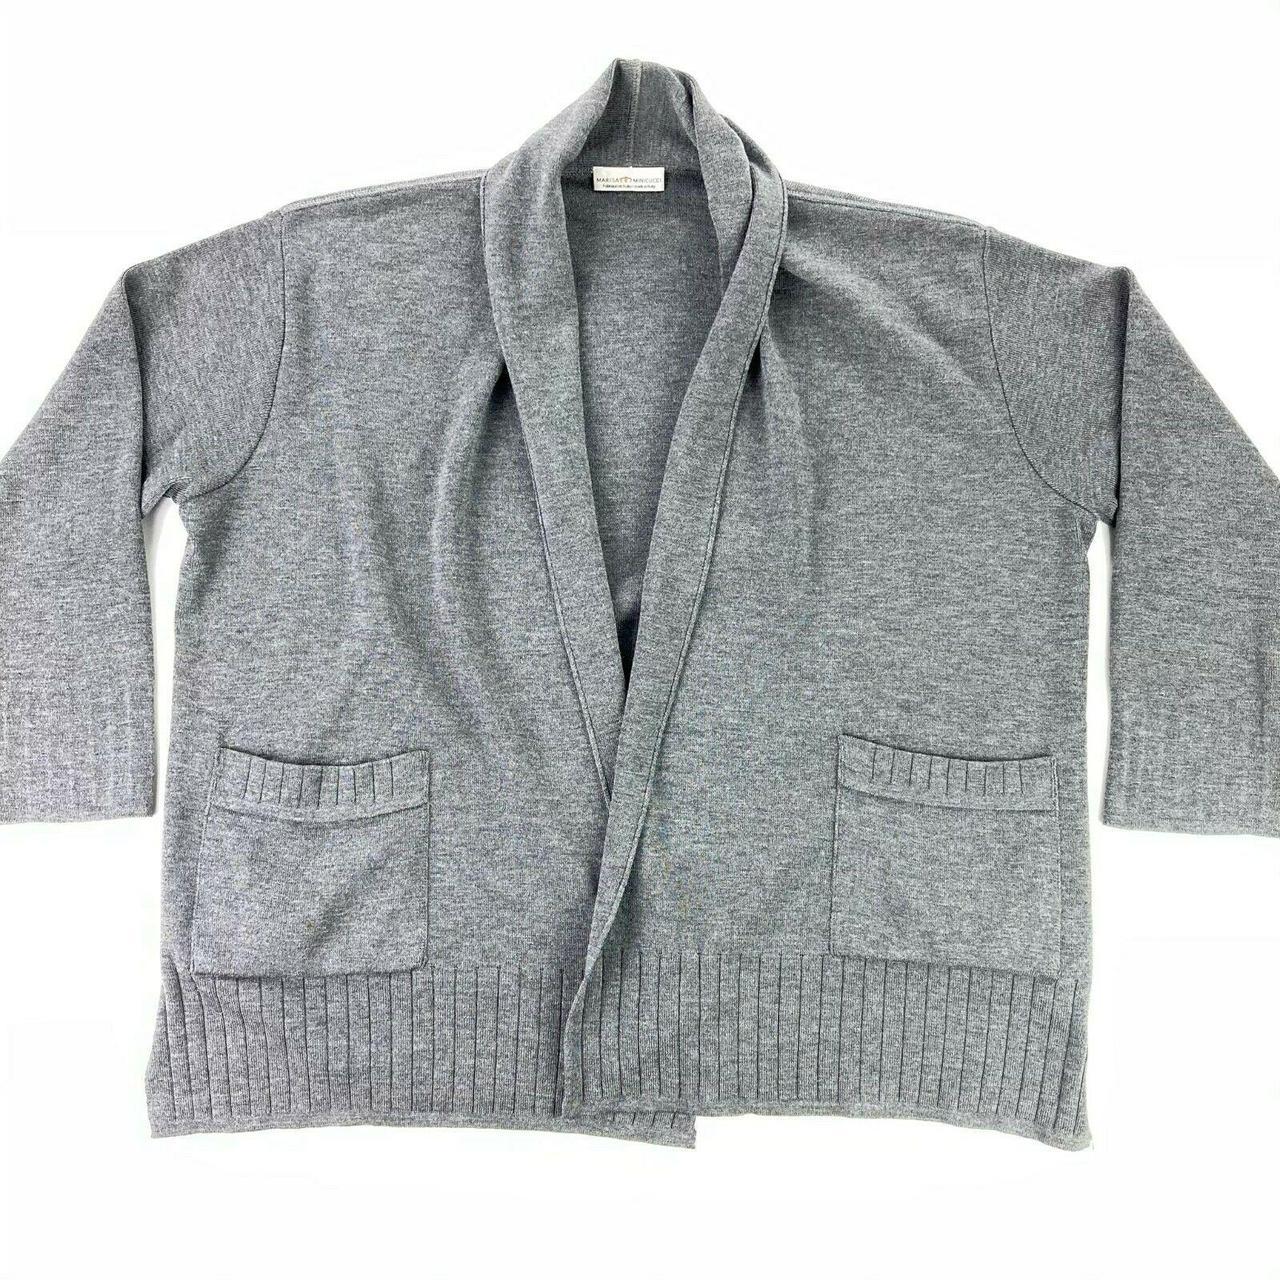 Product Image 1 - Marisa Minicucci Womens Gray Knit